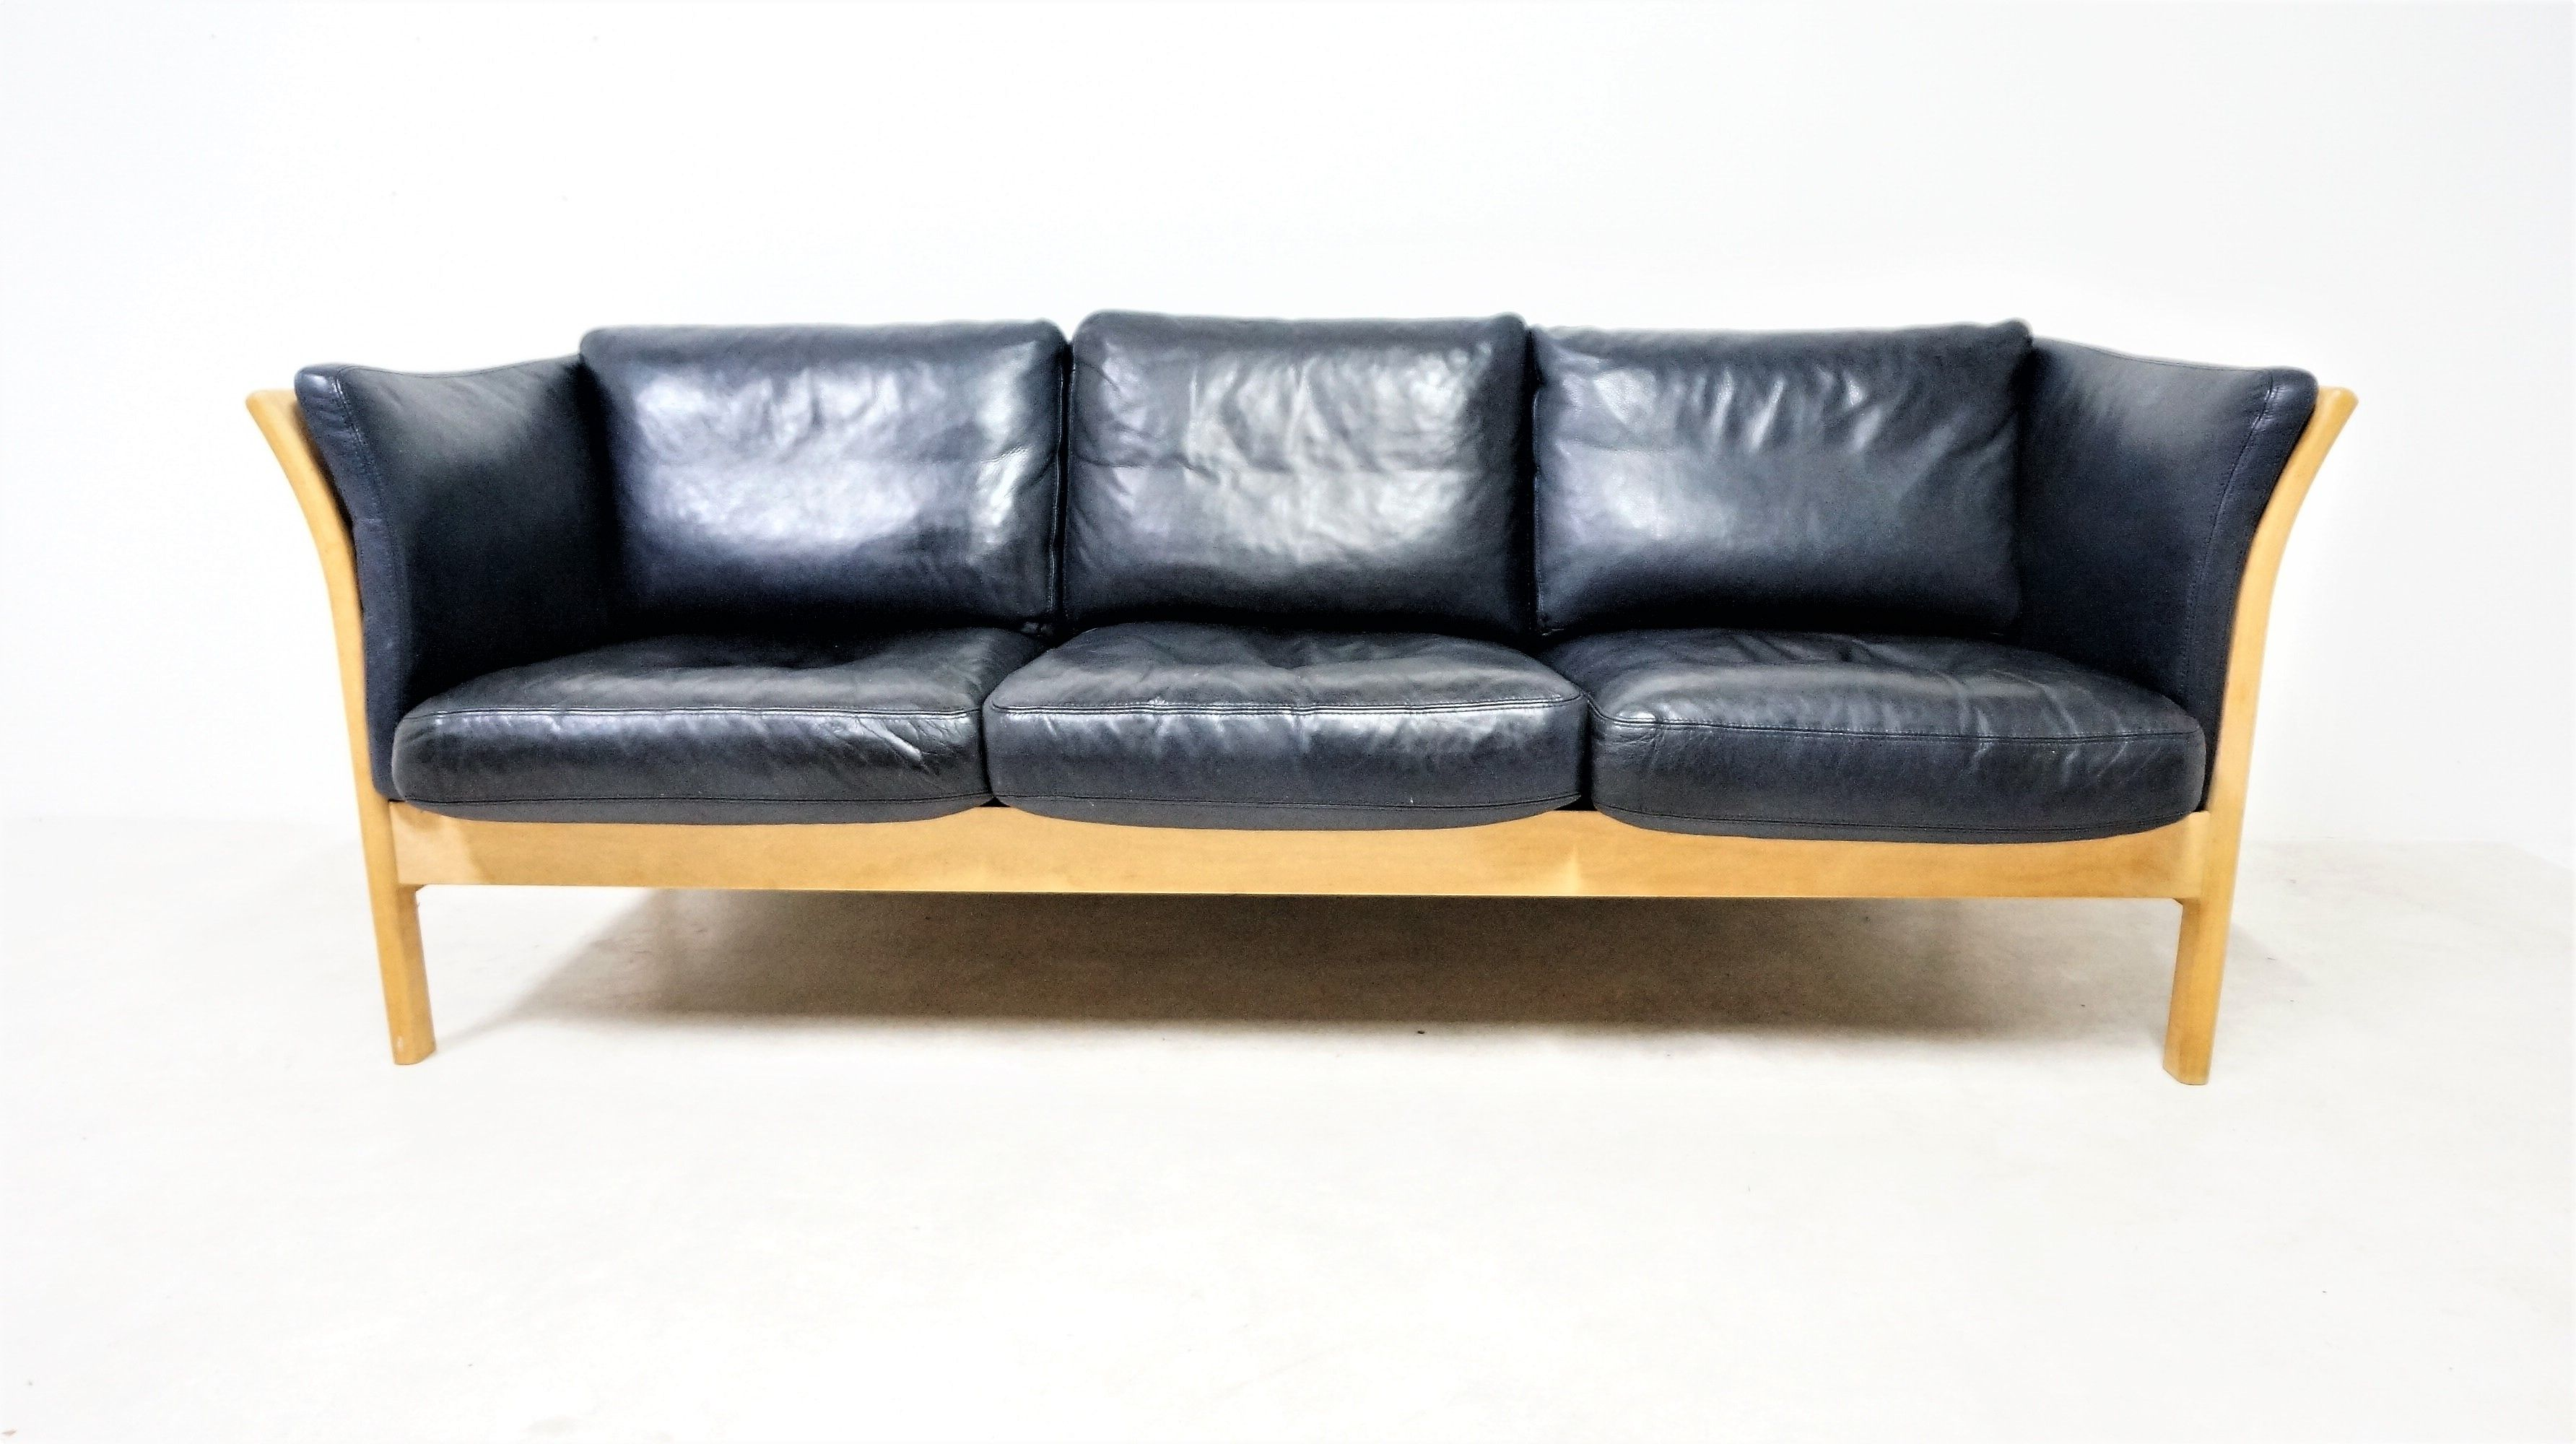 Scandinavian 3-seater sofa in black leather